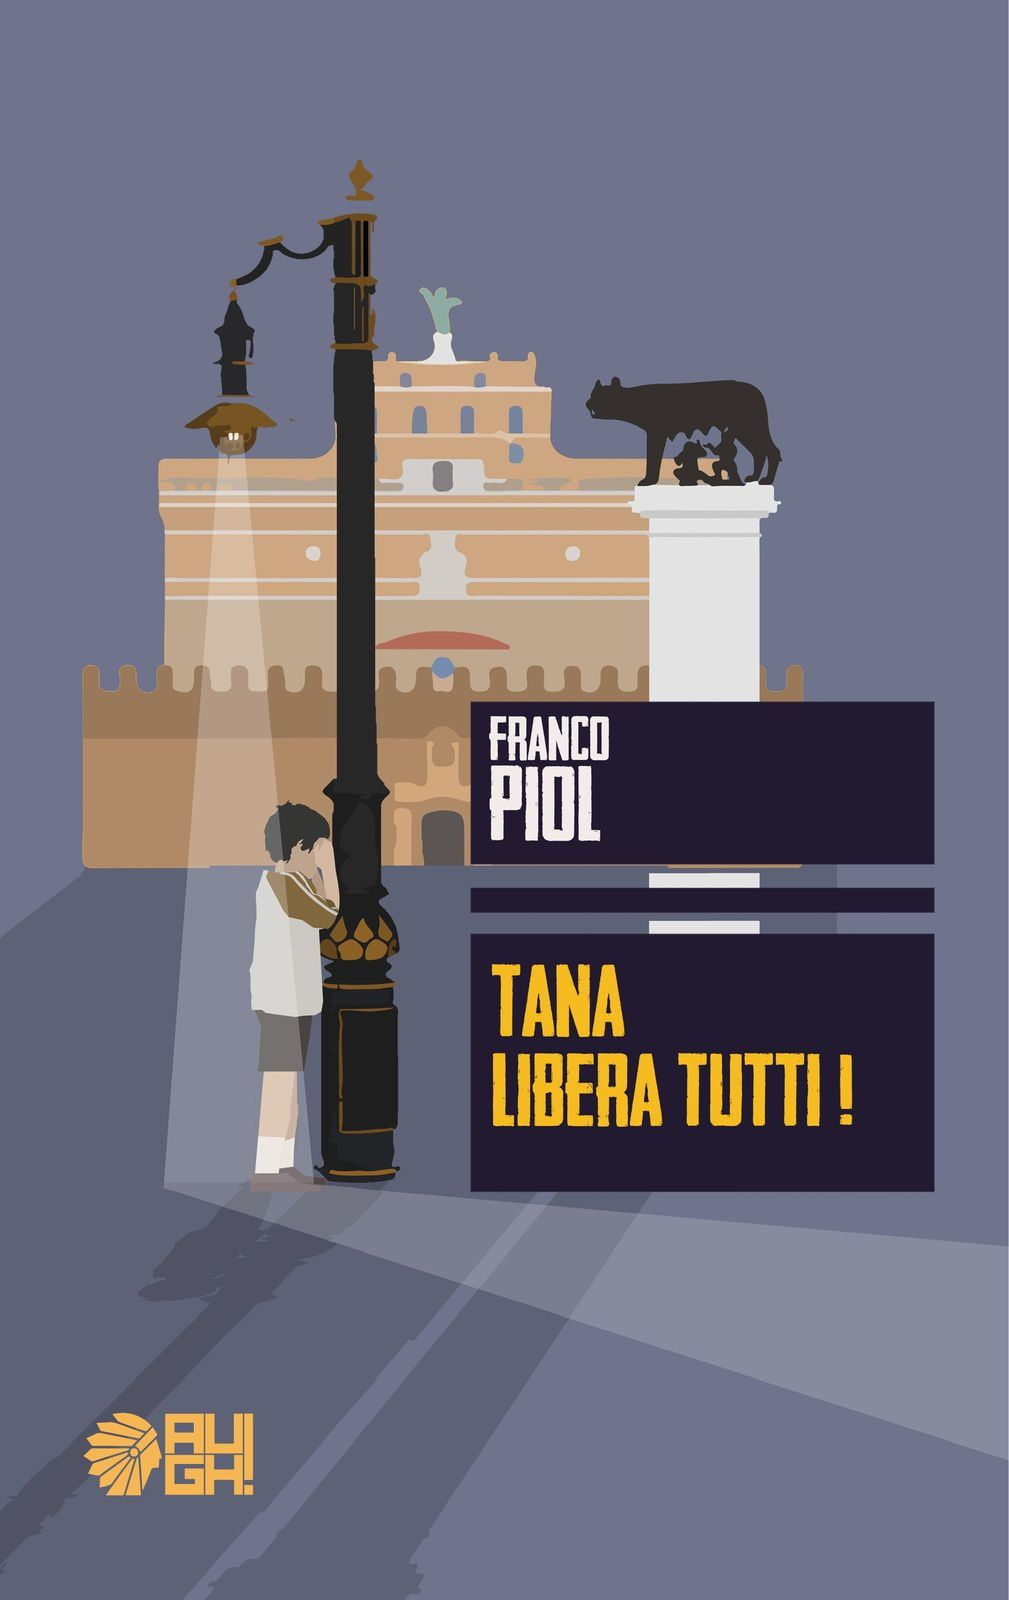 Radioblog: Franco Piol, &quot&#x3B;Tana libera tutti&quot&#x3B;